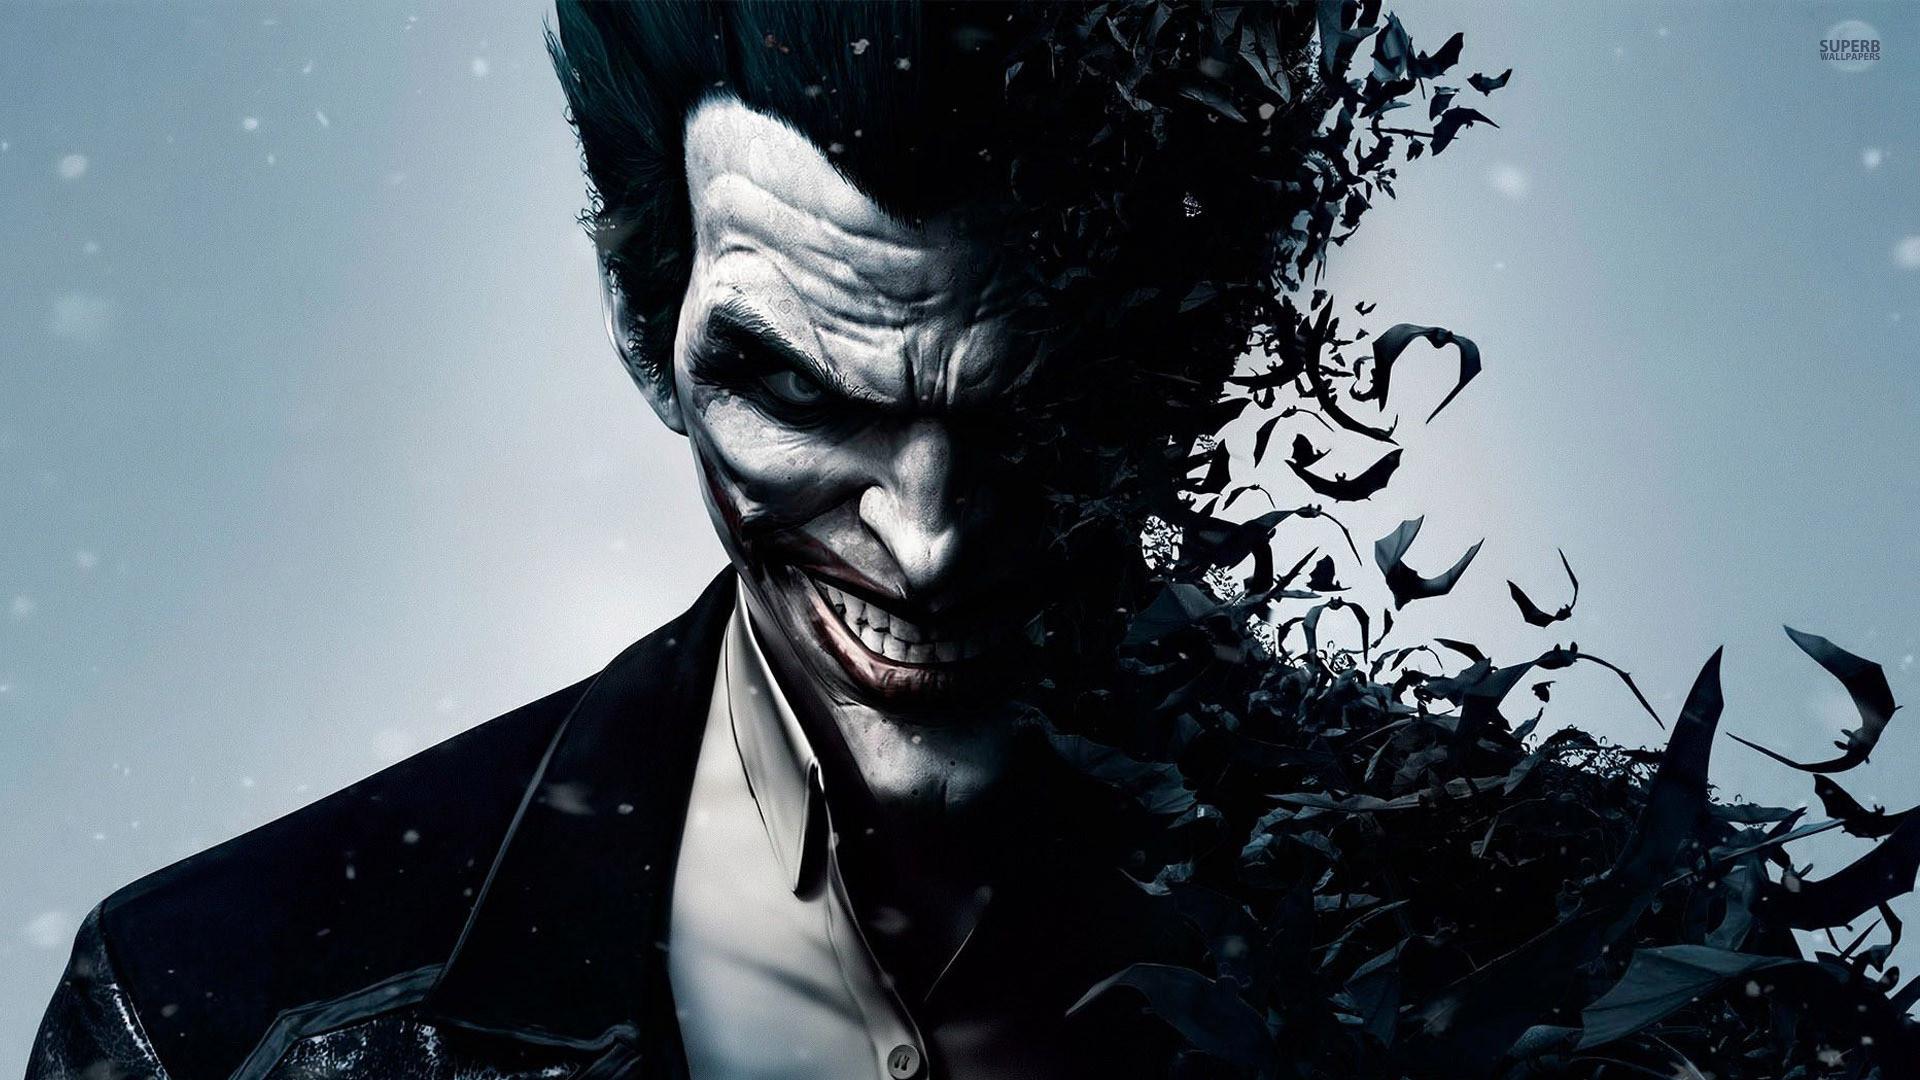 Бэтмен герои комиксов Джокер  № 3922452 без смс